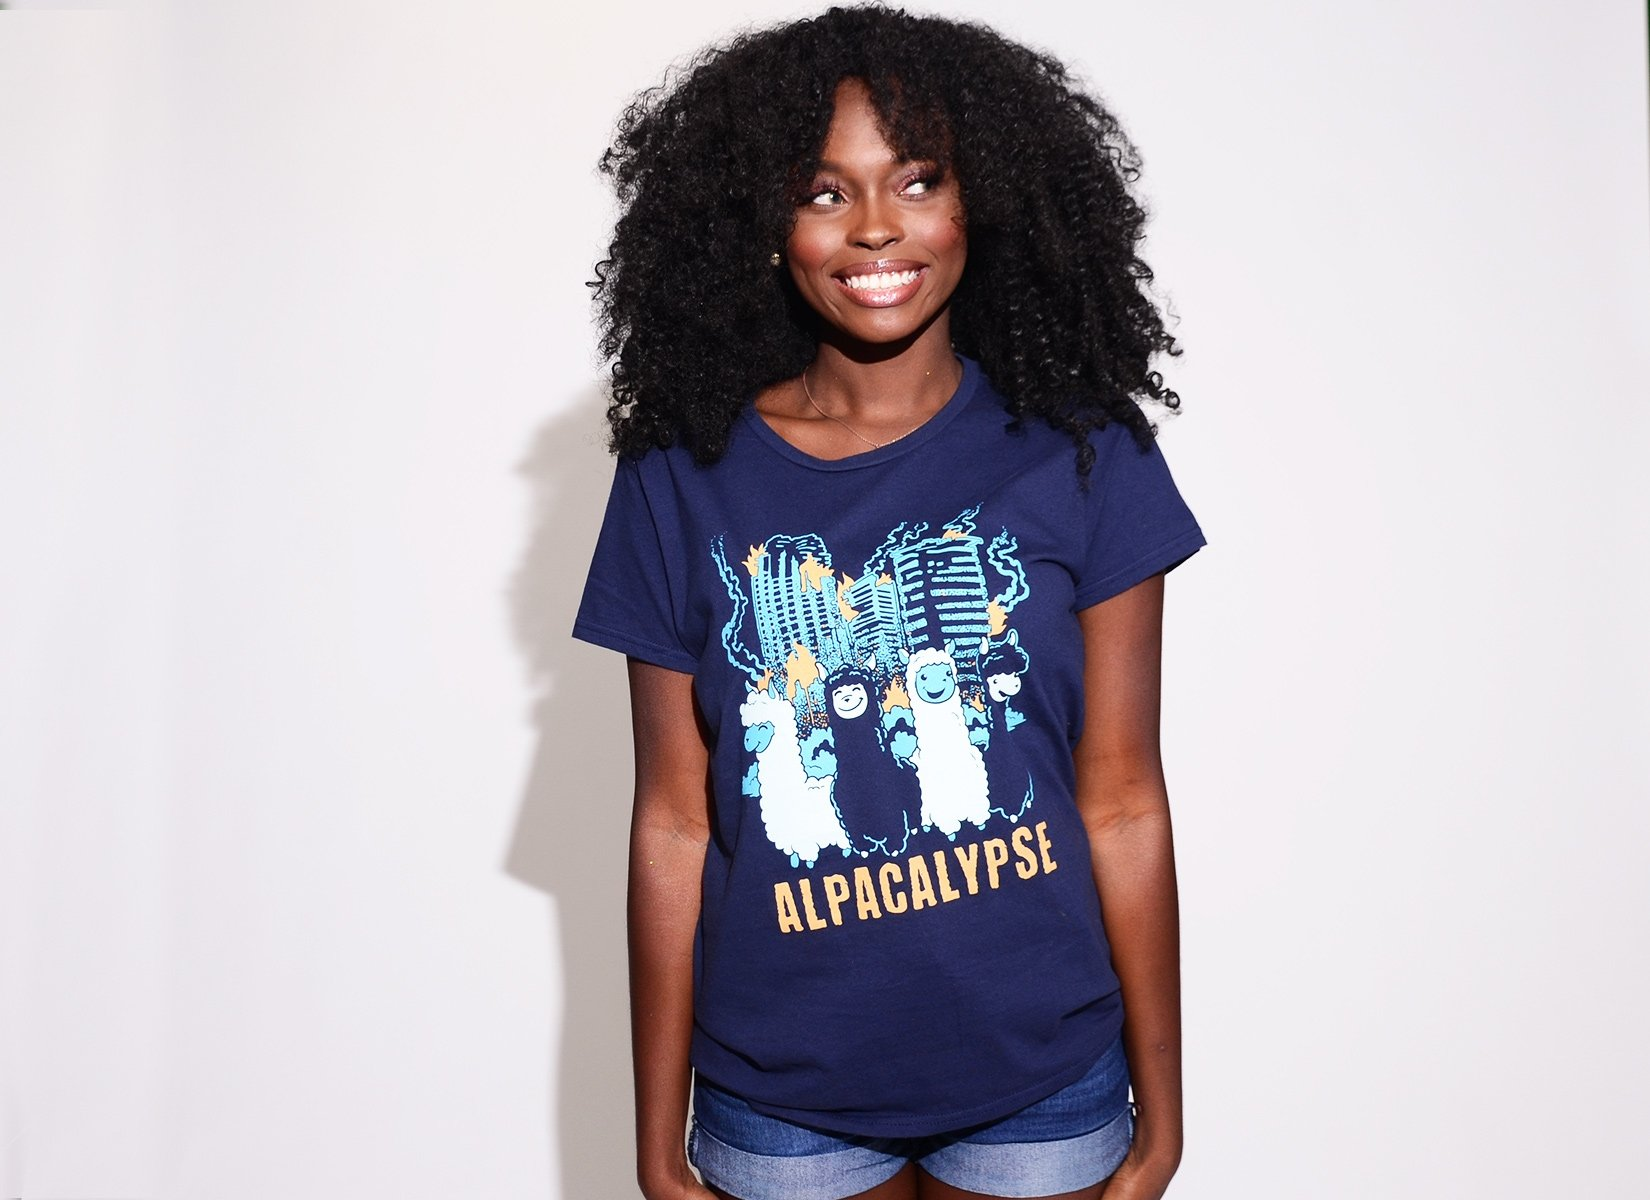 Alpacalypse on Womens T-Shirt